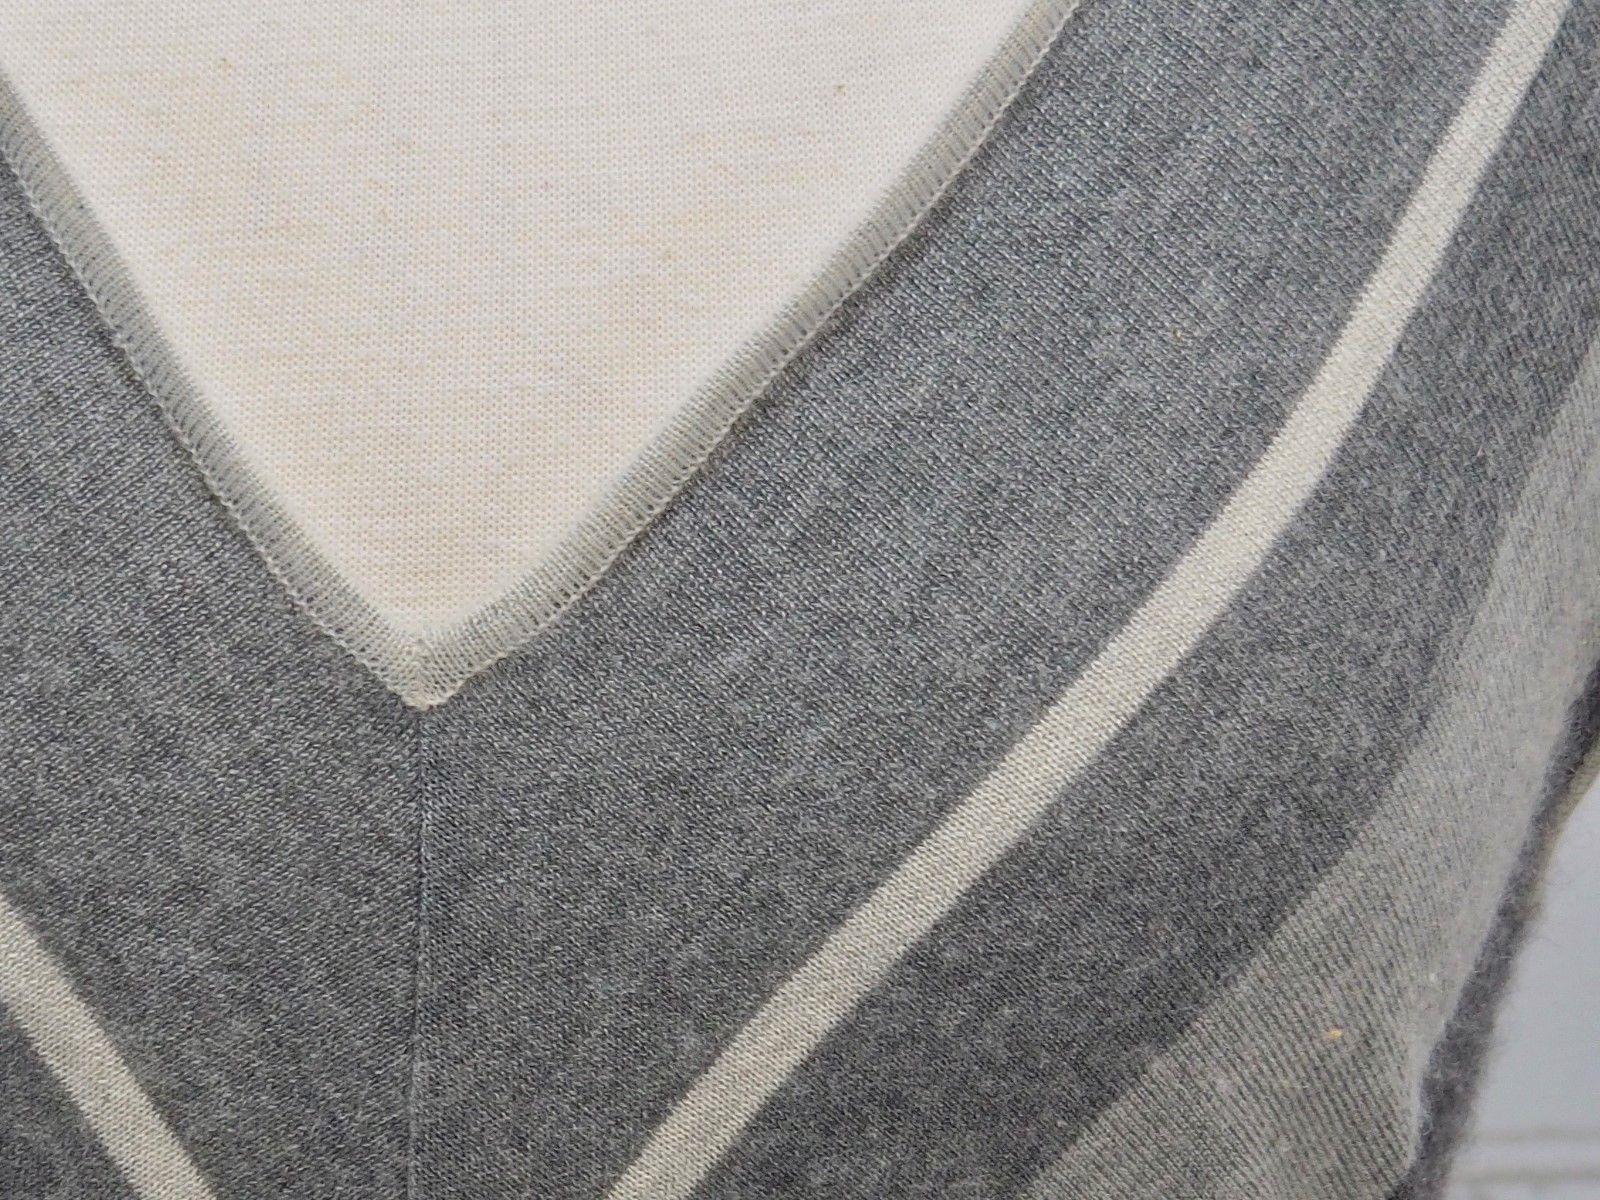 4b7e62da59a397 RALPH LAUREN Cashmere Silk Black Label Sleeveless Sweater Vest Gray Stripes  Med